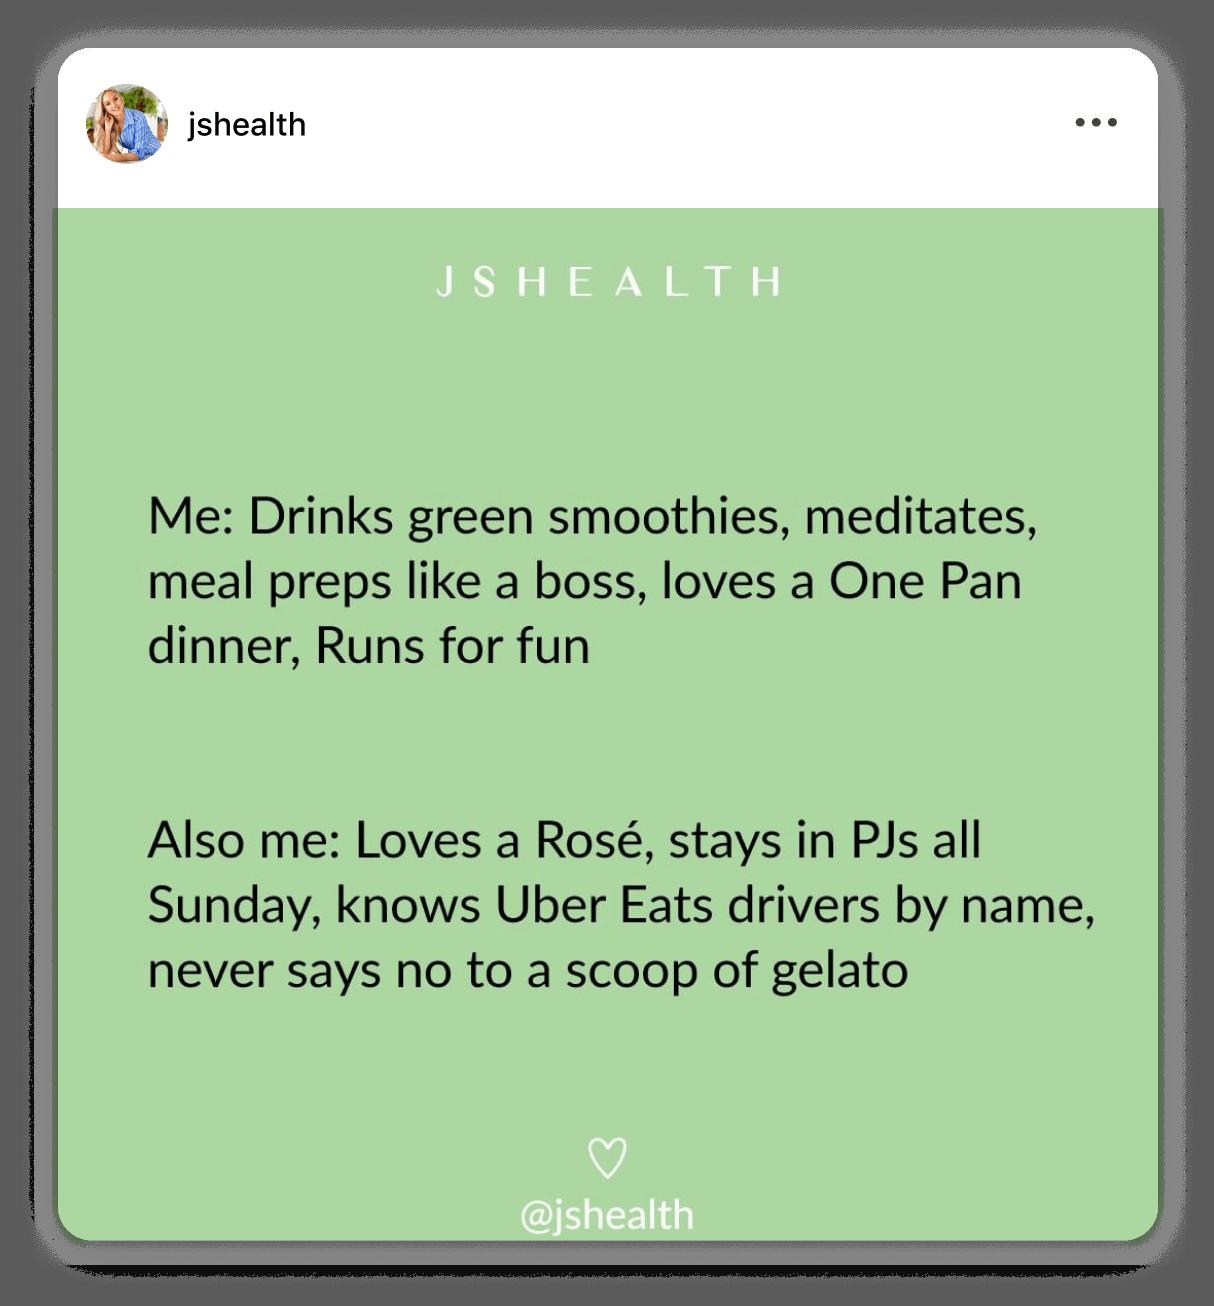 @jshealth